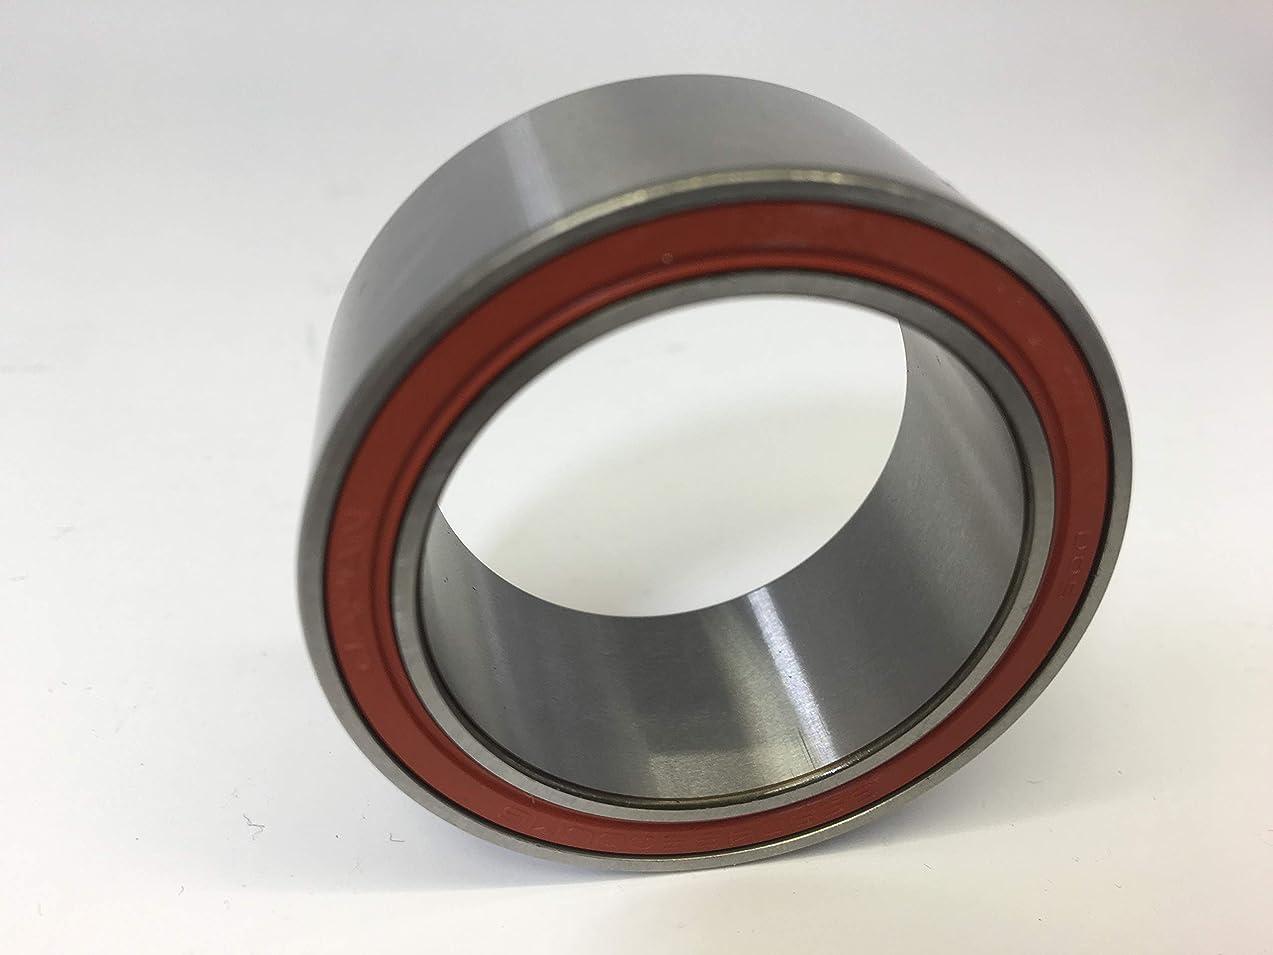 NSK EP35BD4820 AC Compressor Clutch Bearing